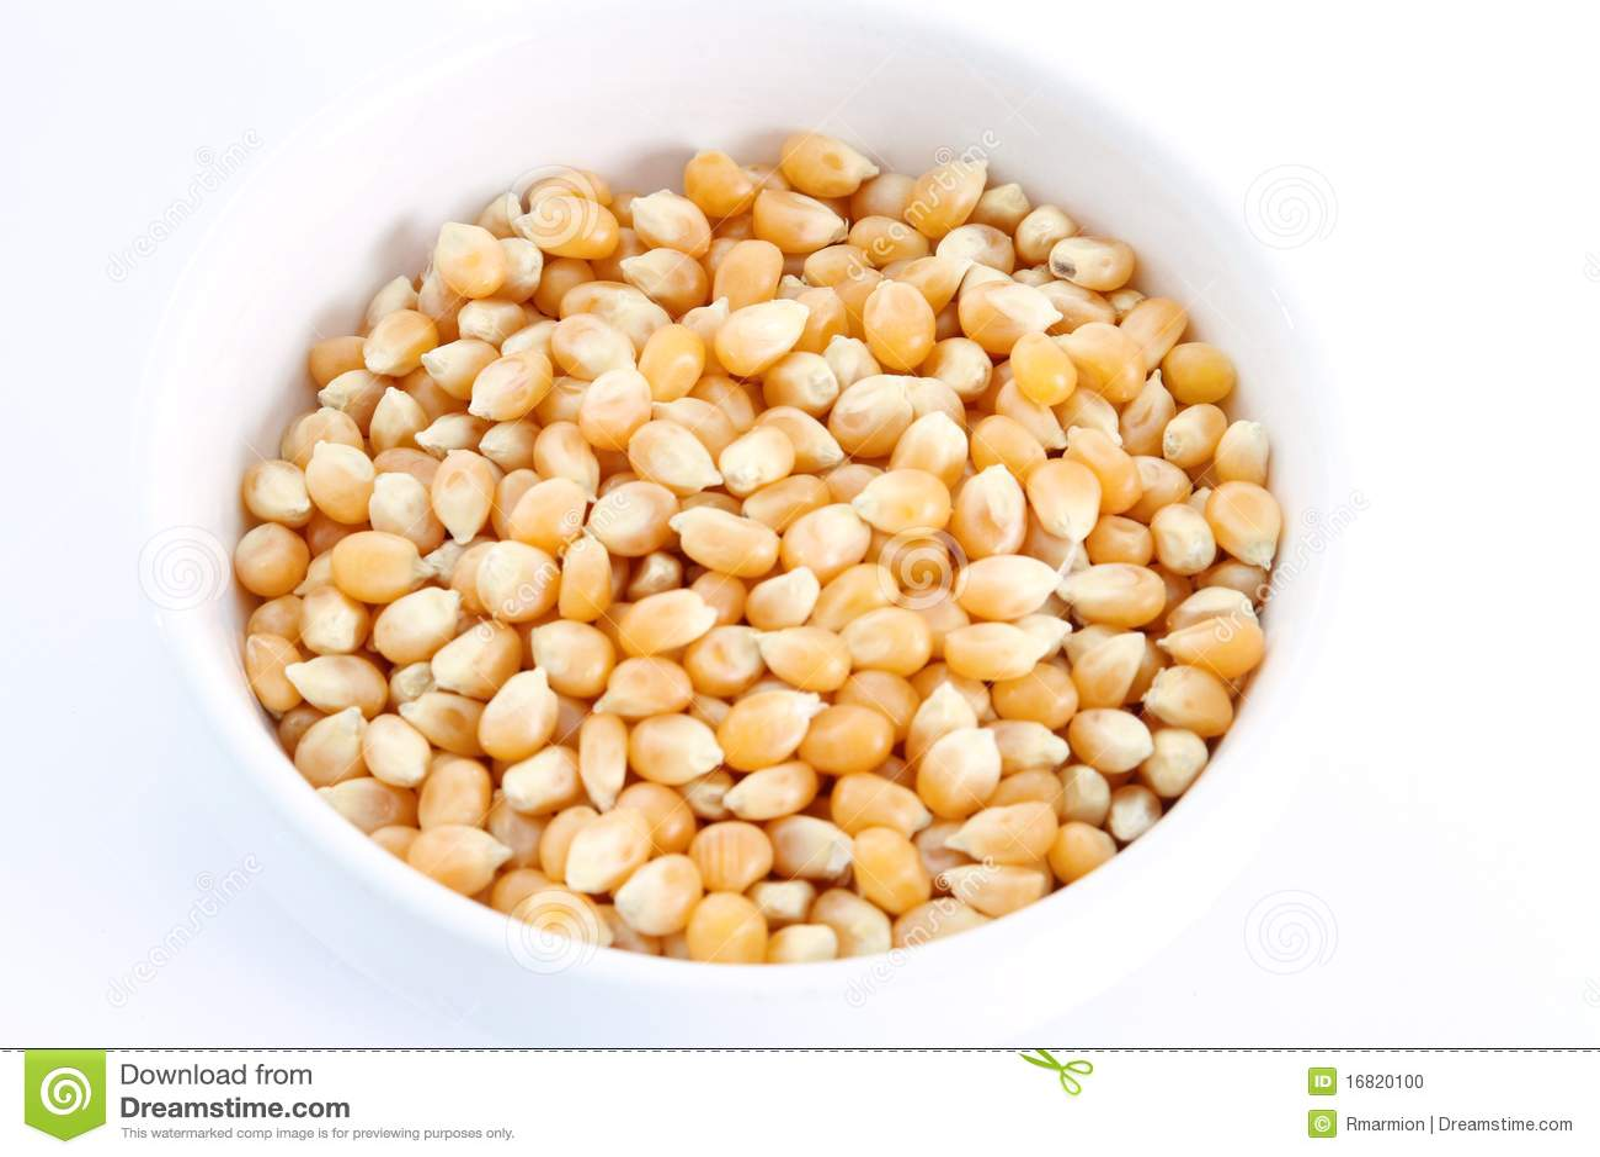 Popcorn: Kernels Popcorn